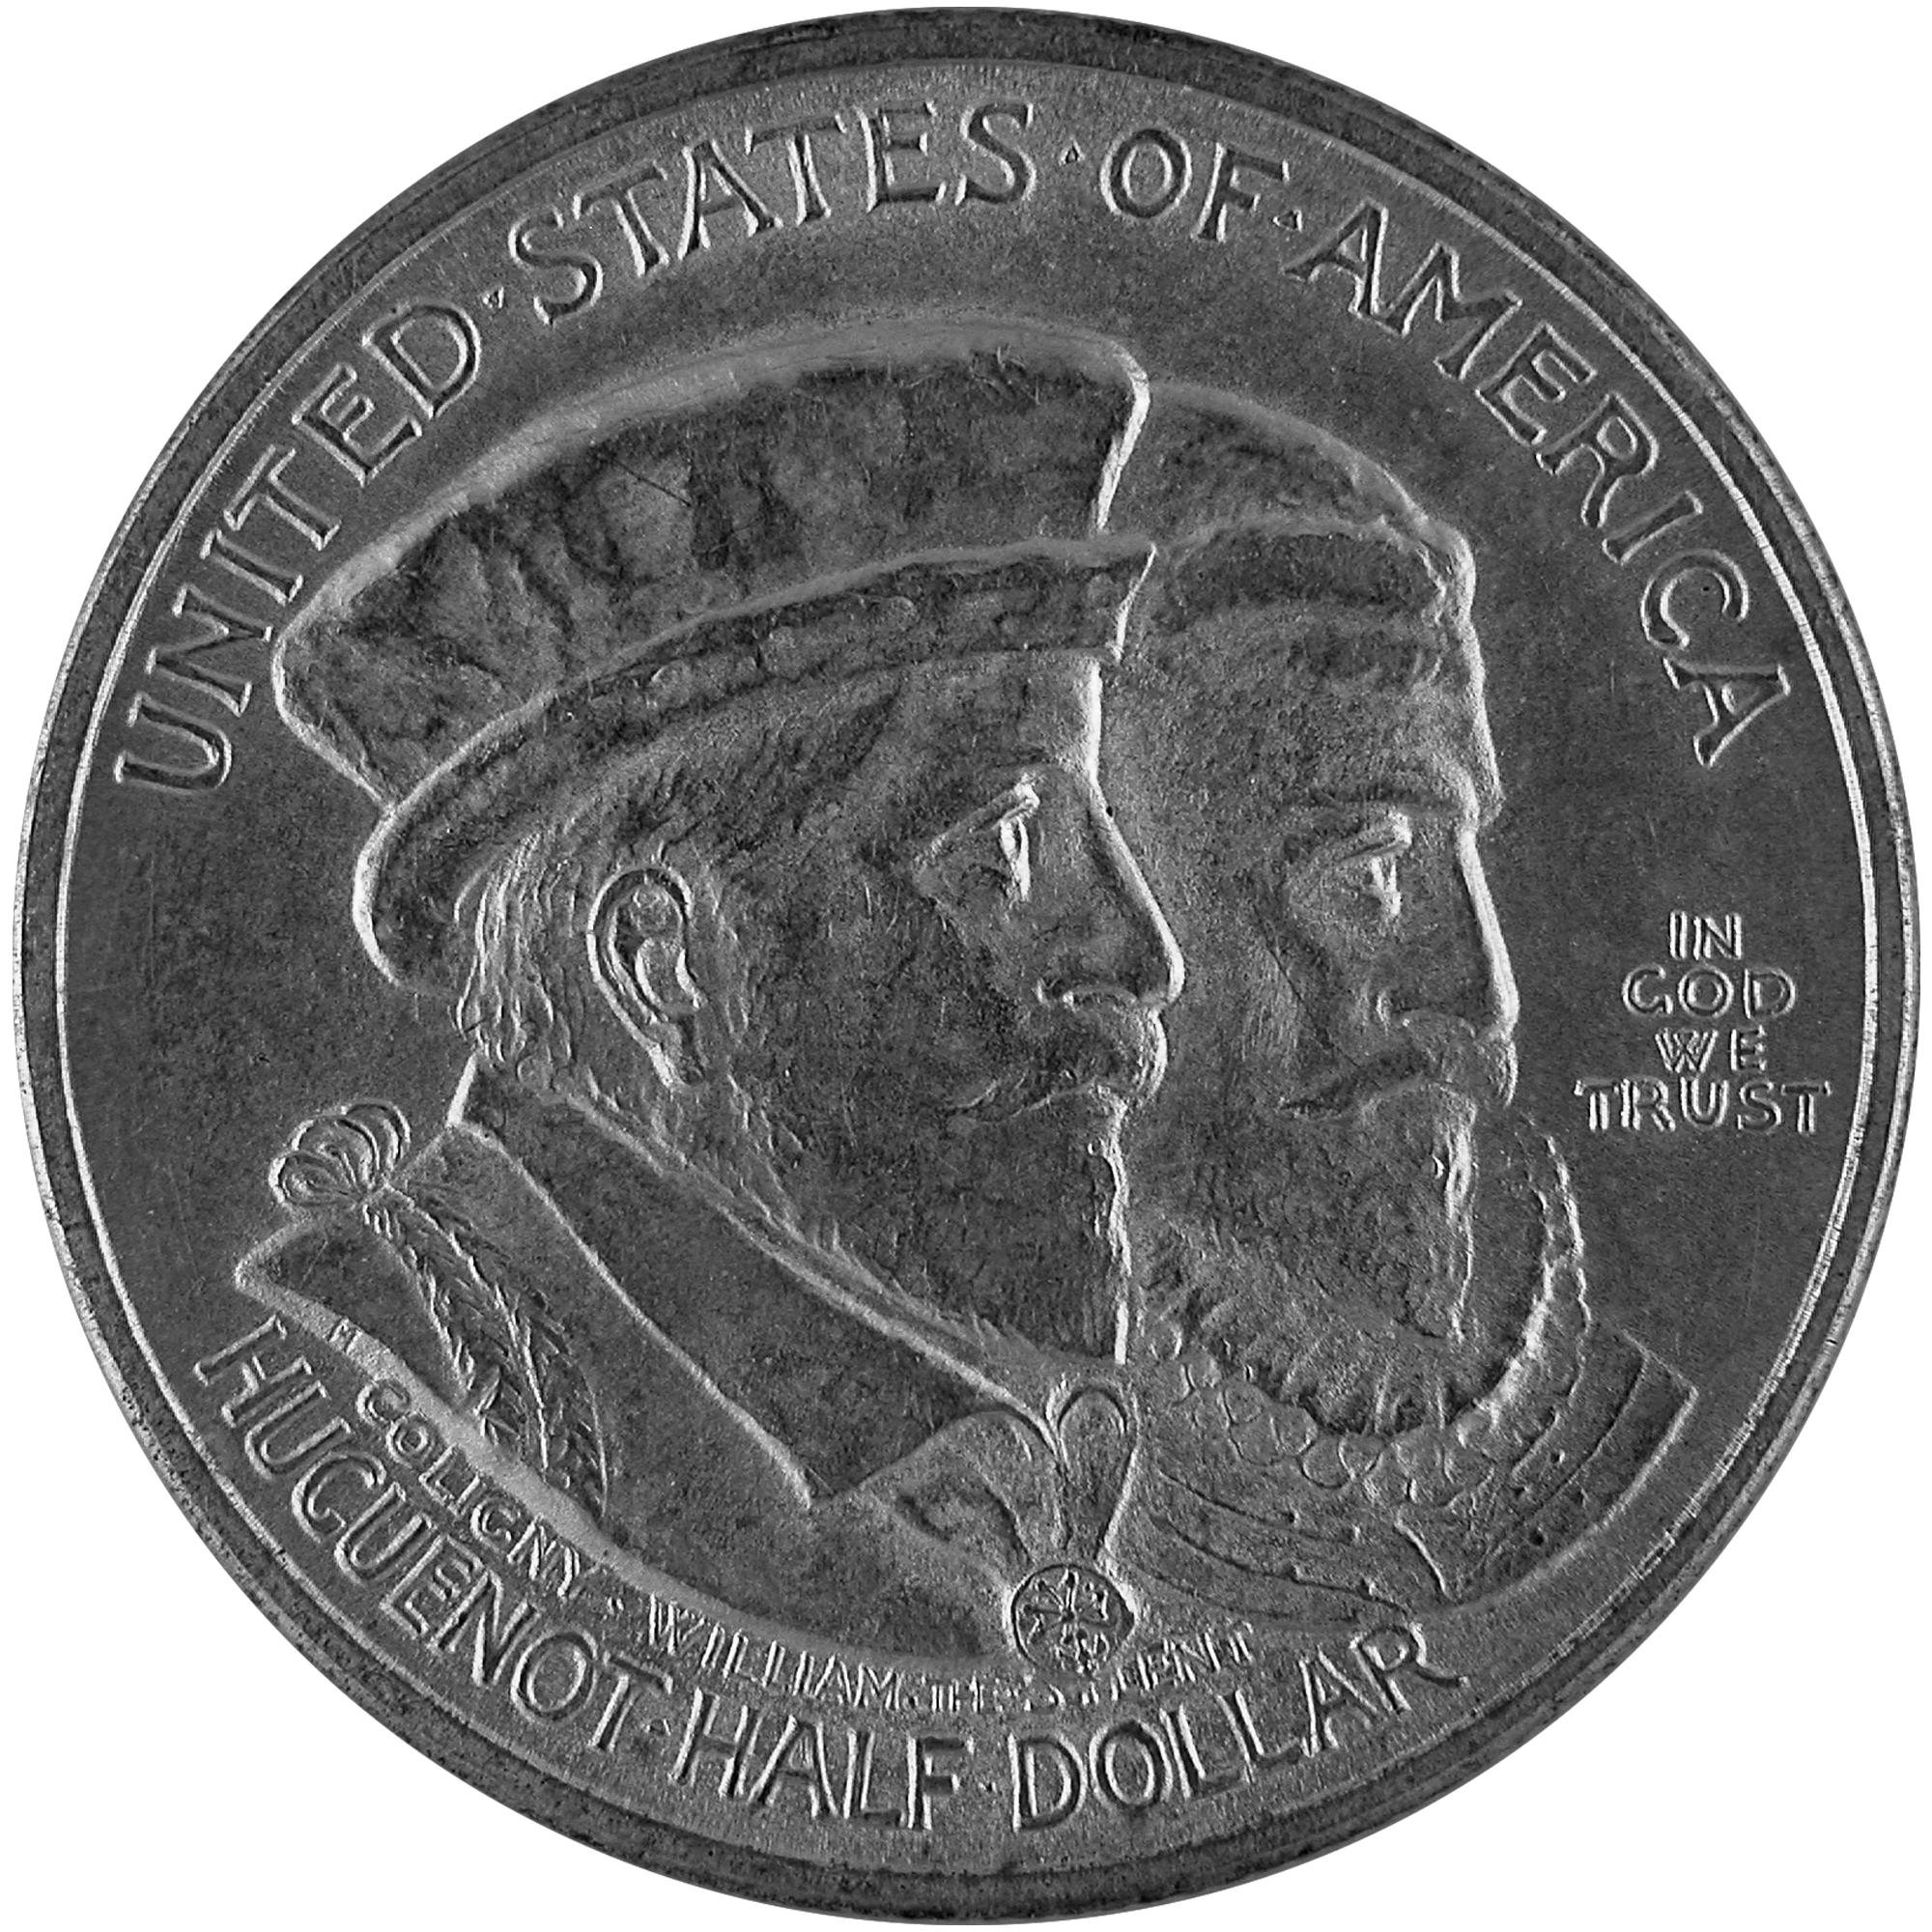 1924 Huguenot Walloon Tercentenary Commemorative Silver Half Dollar Coin Obverse